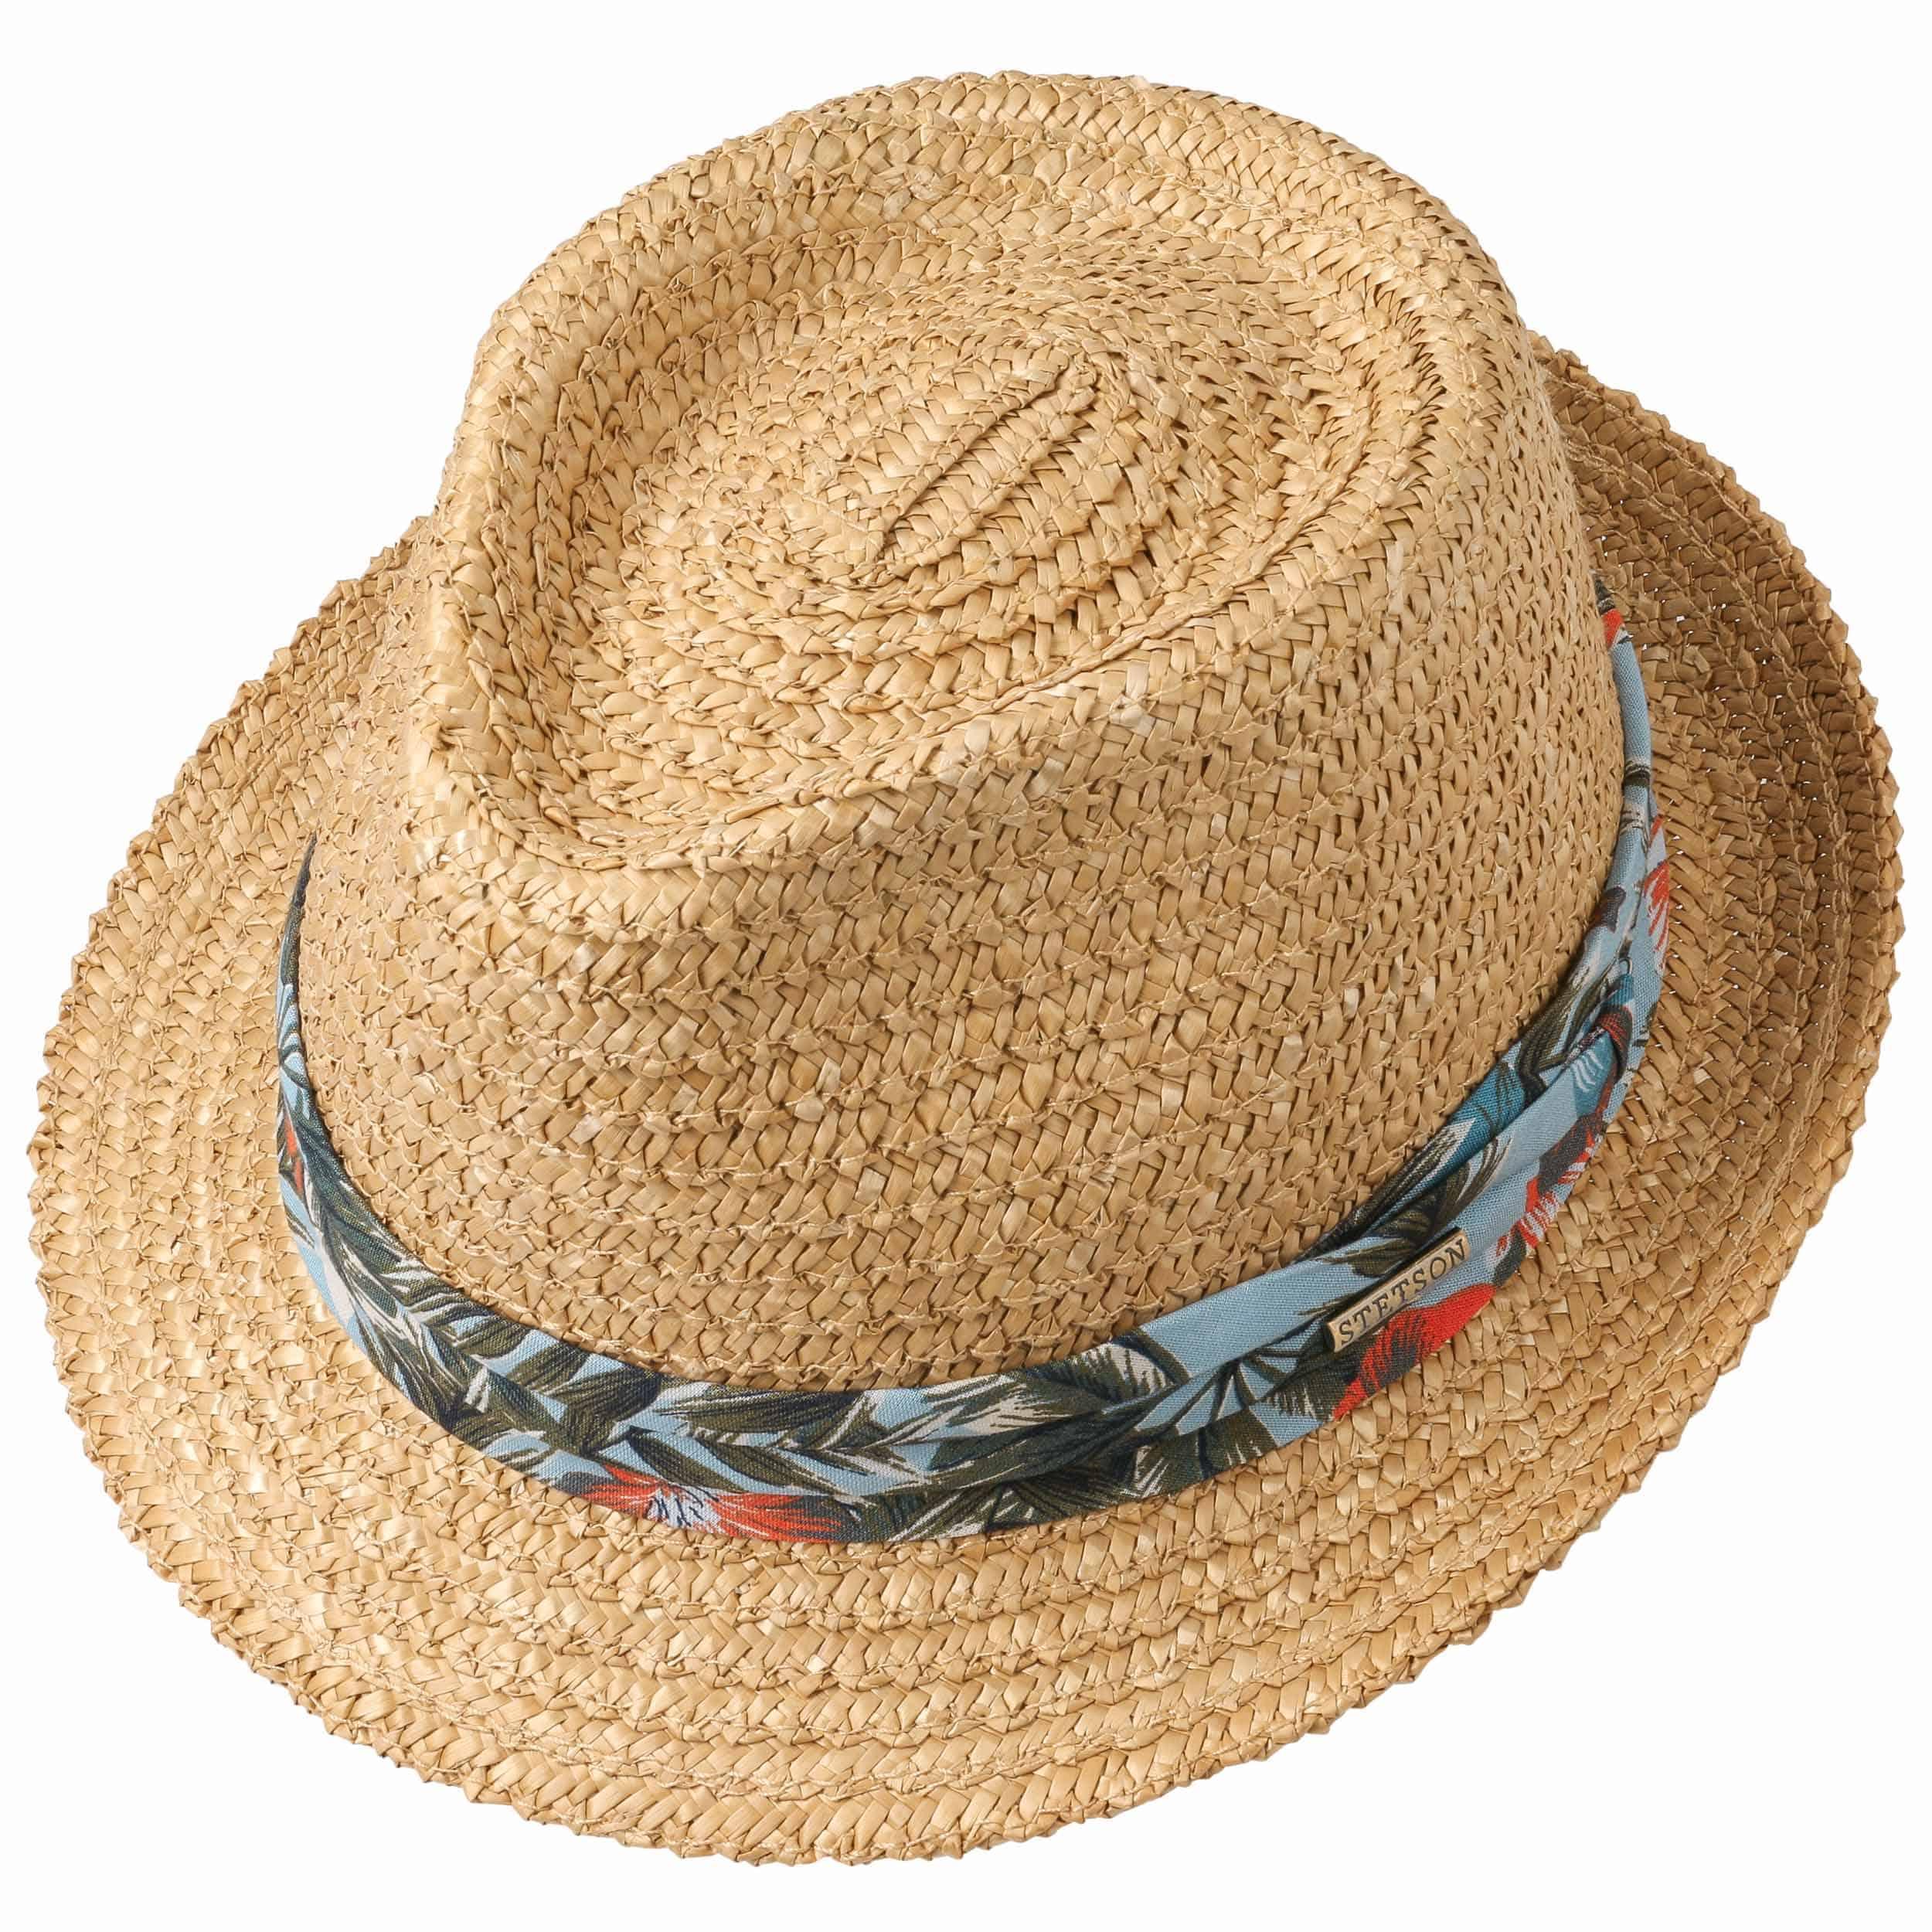 Sombrero de Paja Flower Trilby by Stetson - Sombreros - sombreroshop.es f478f7cb45d